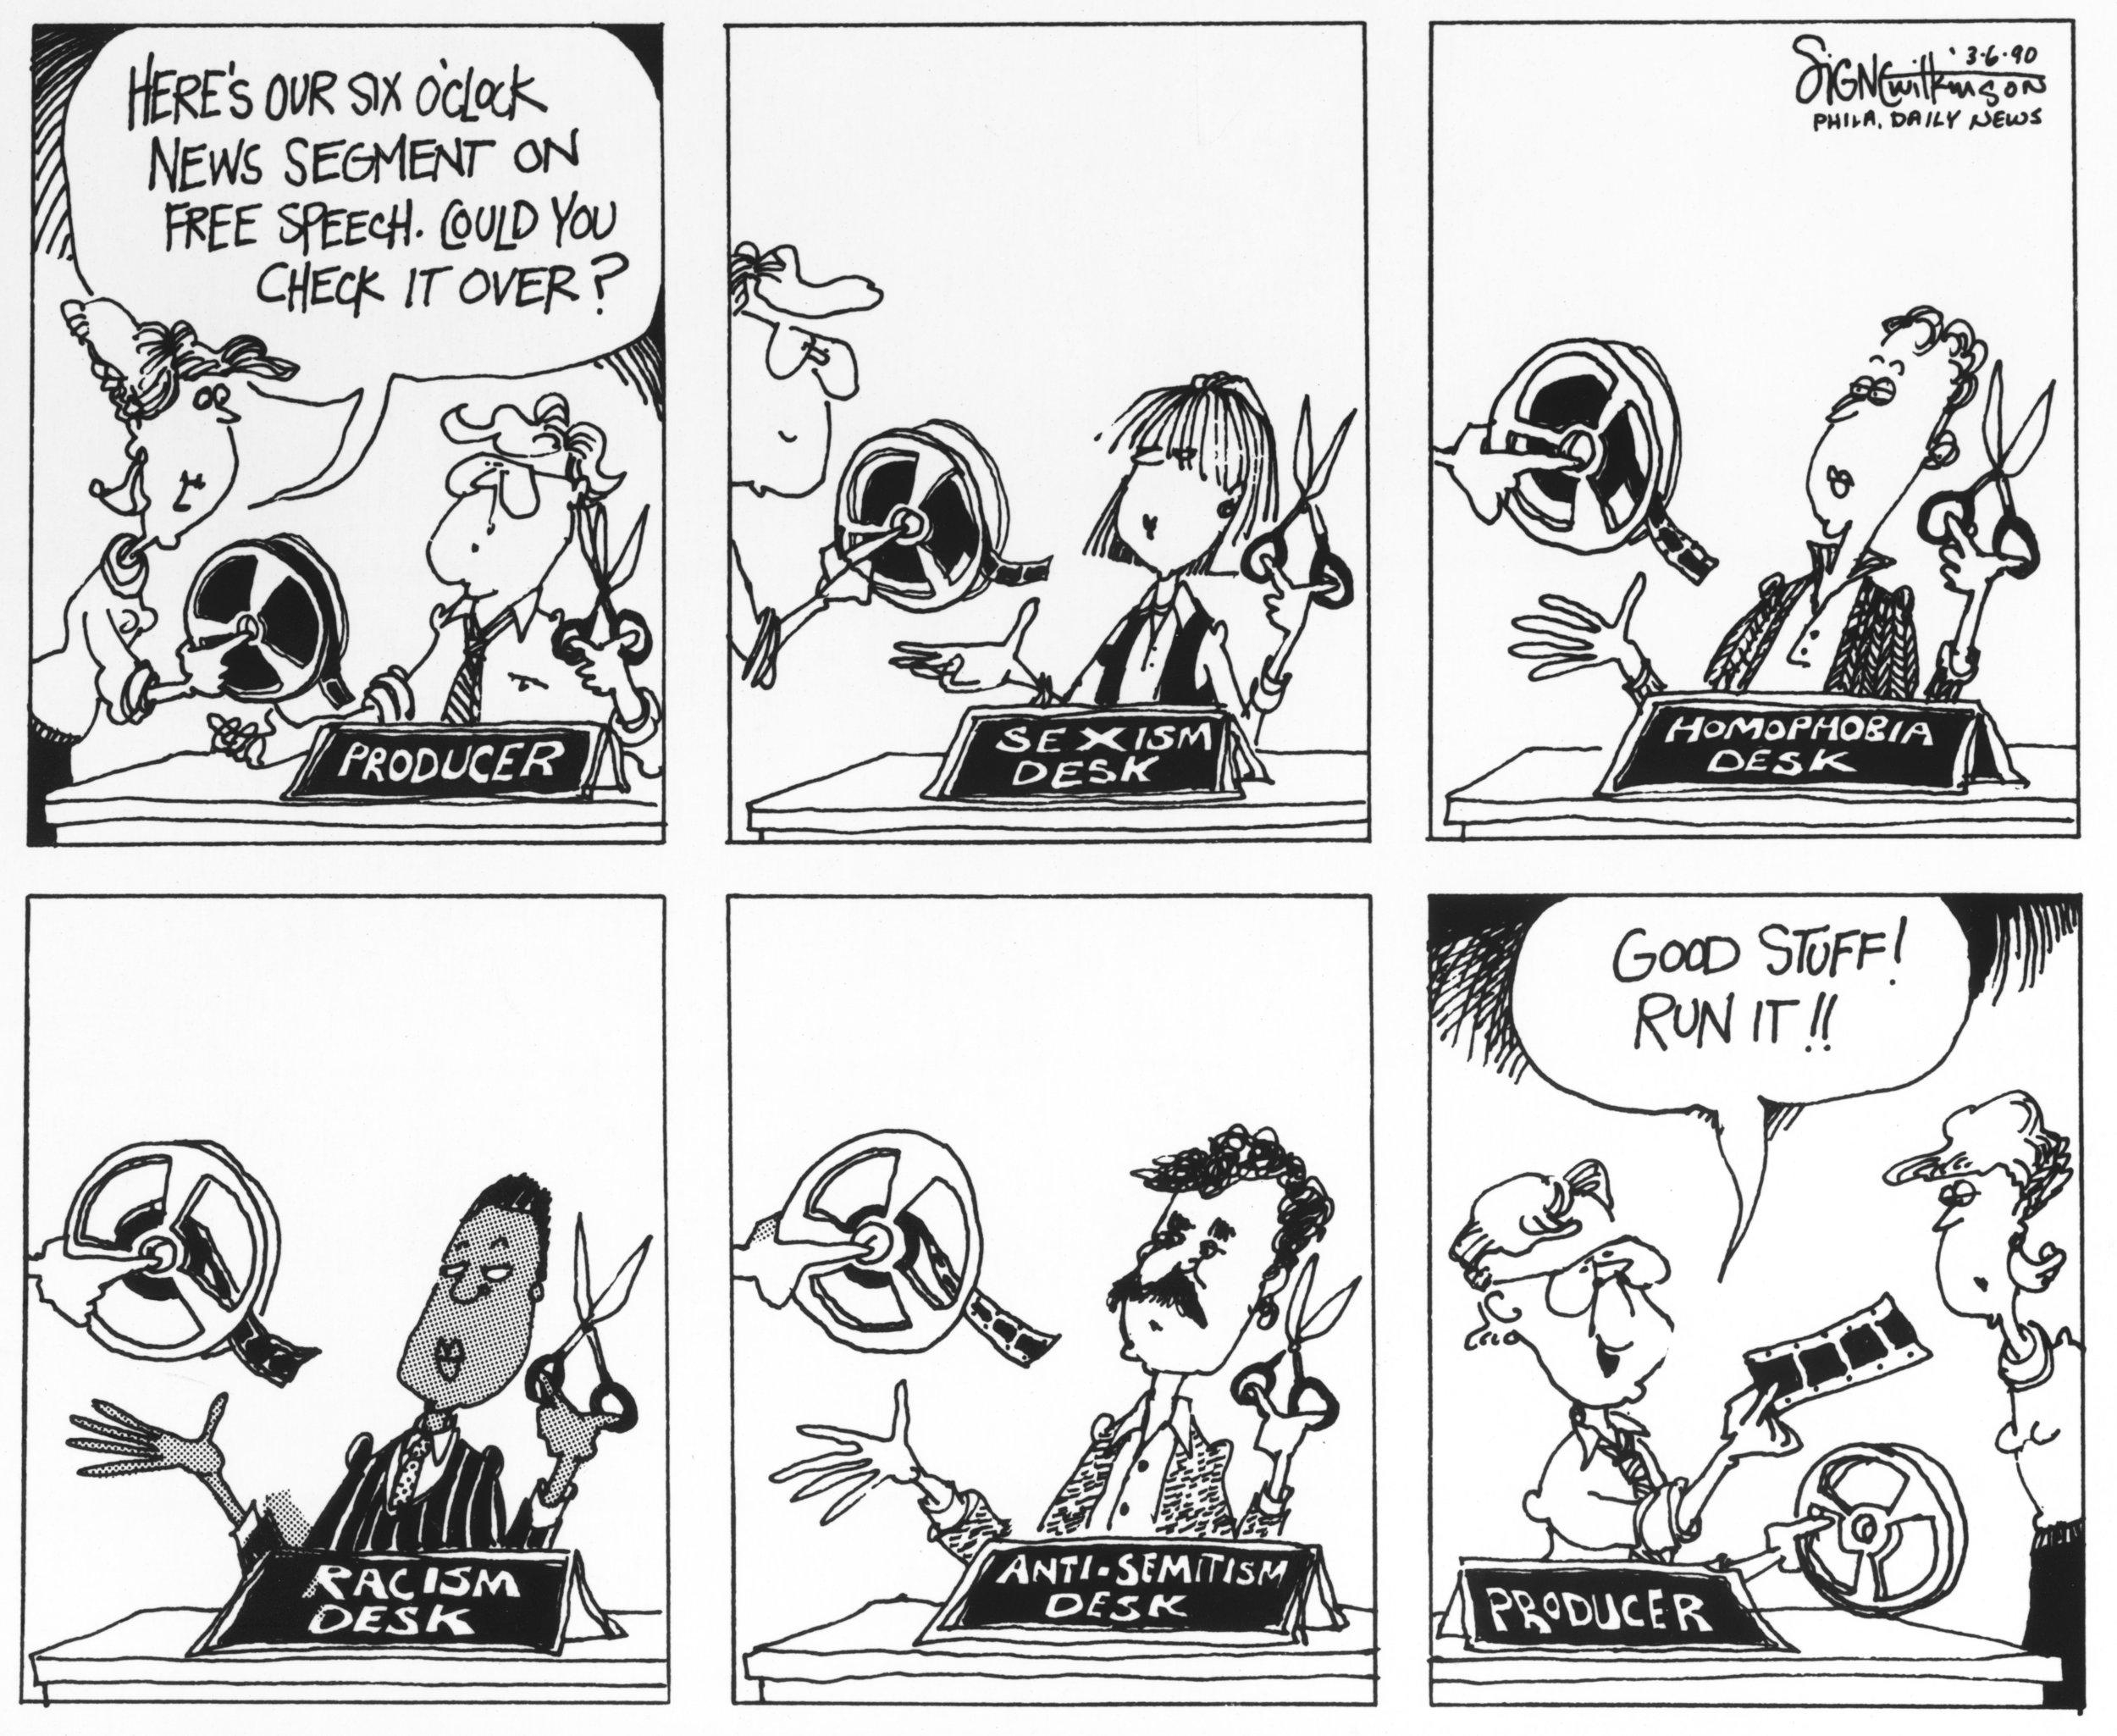 1990-03-06 News Segment on Free Speech.jpg